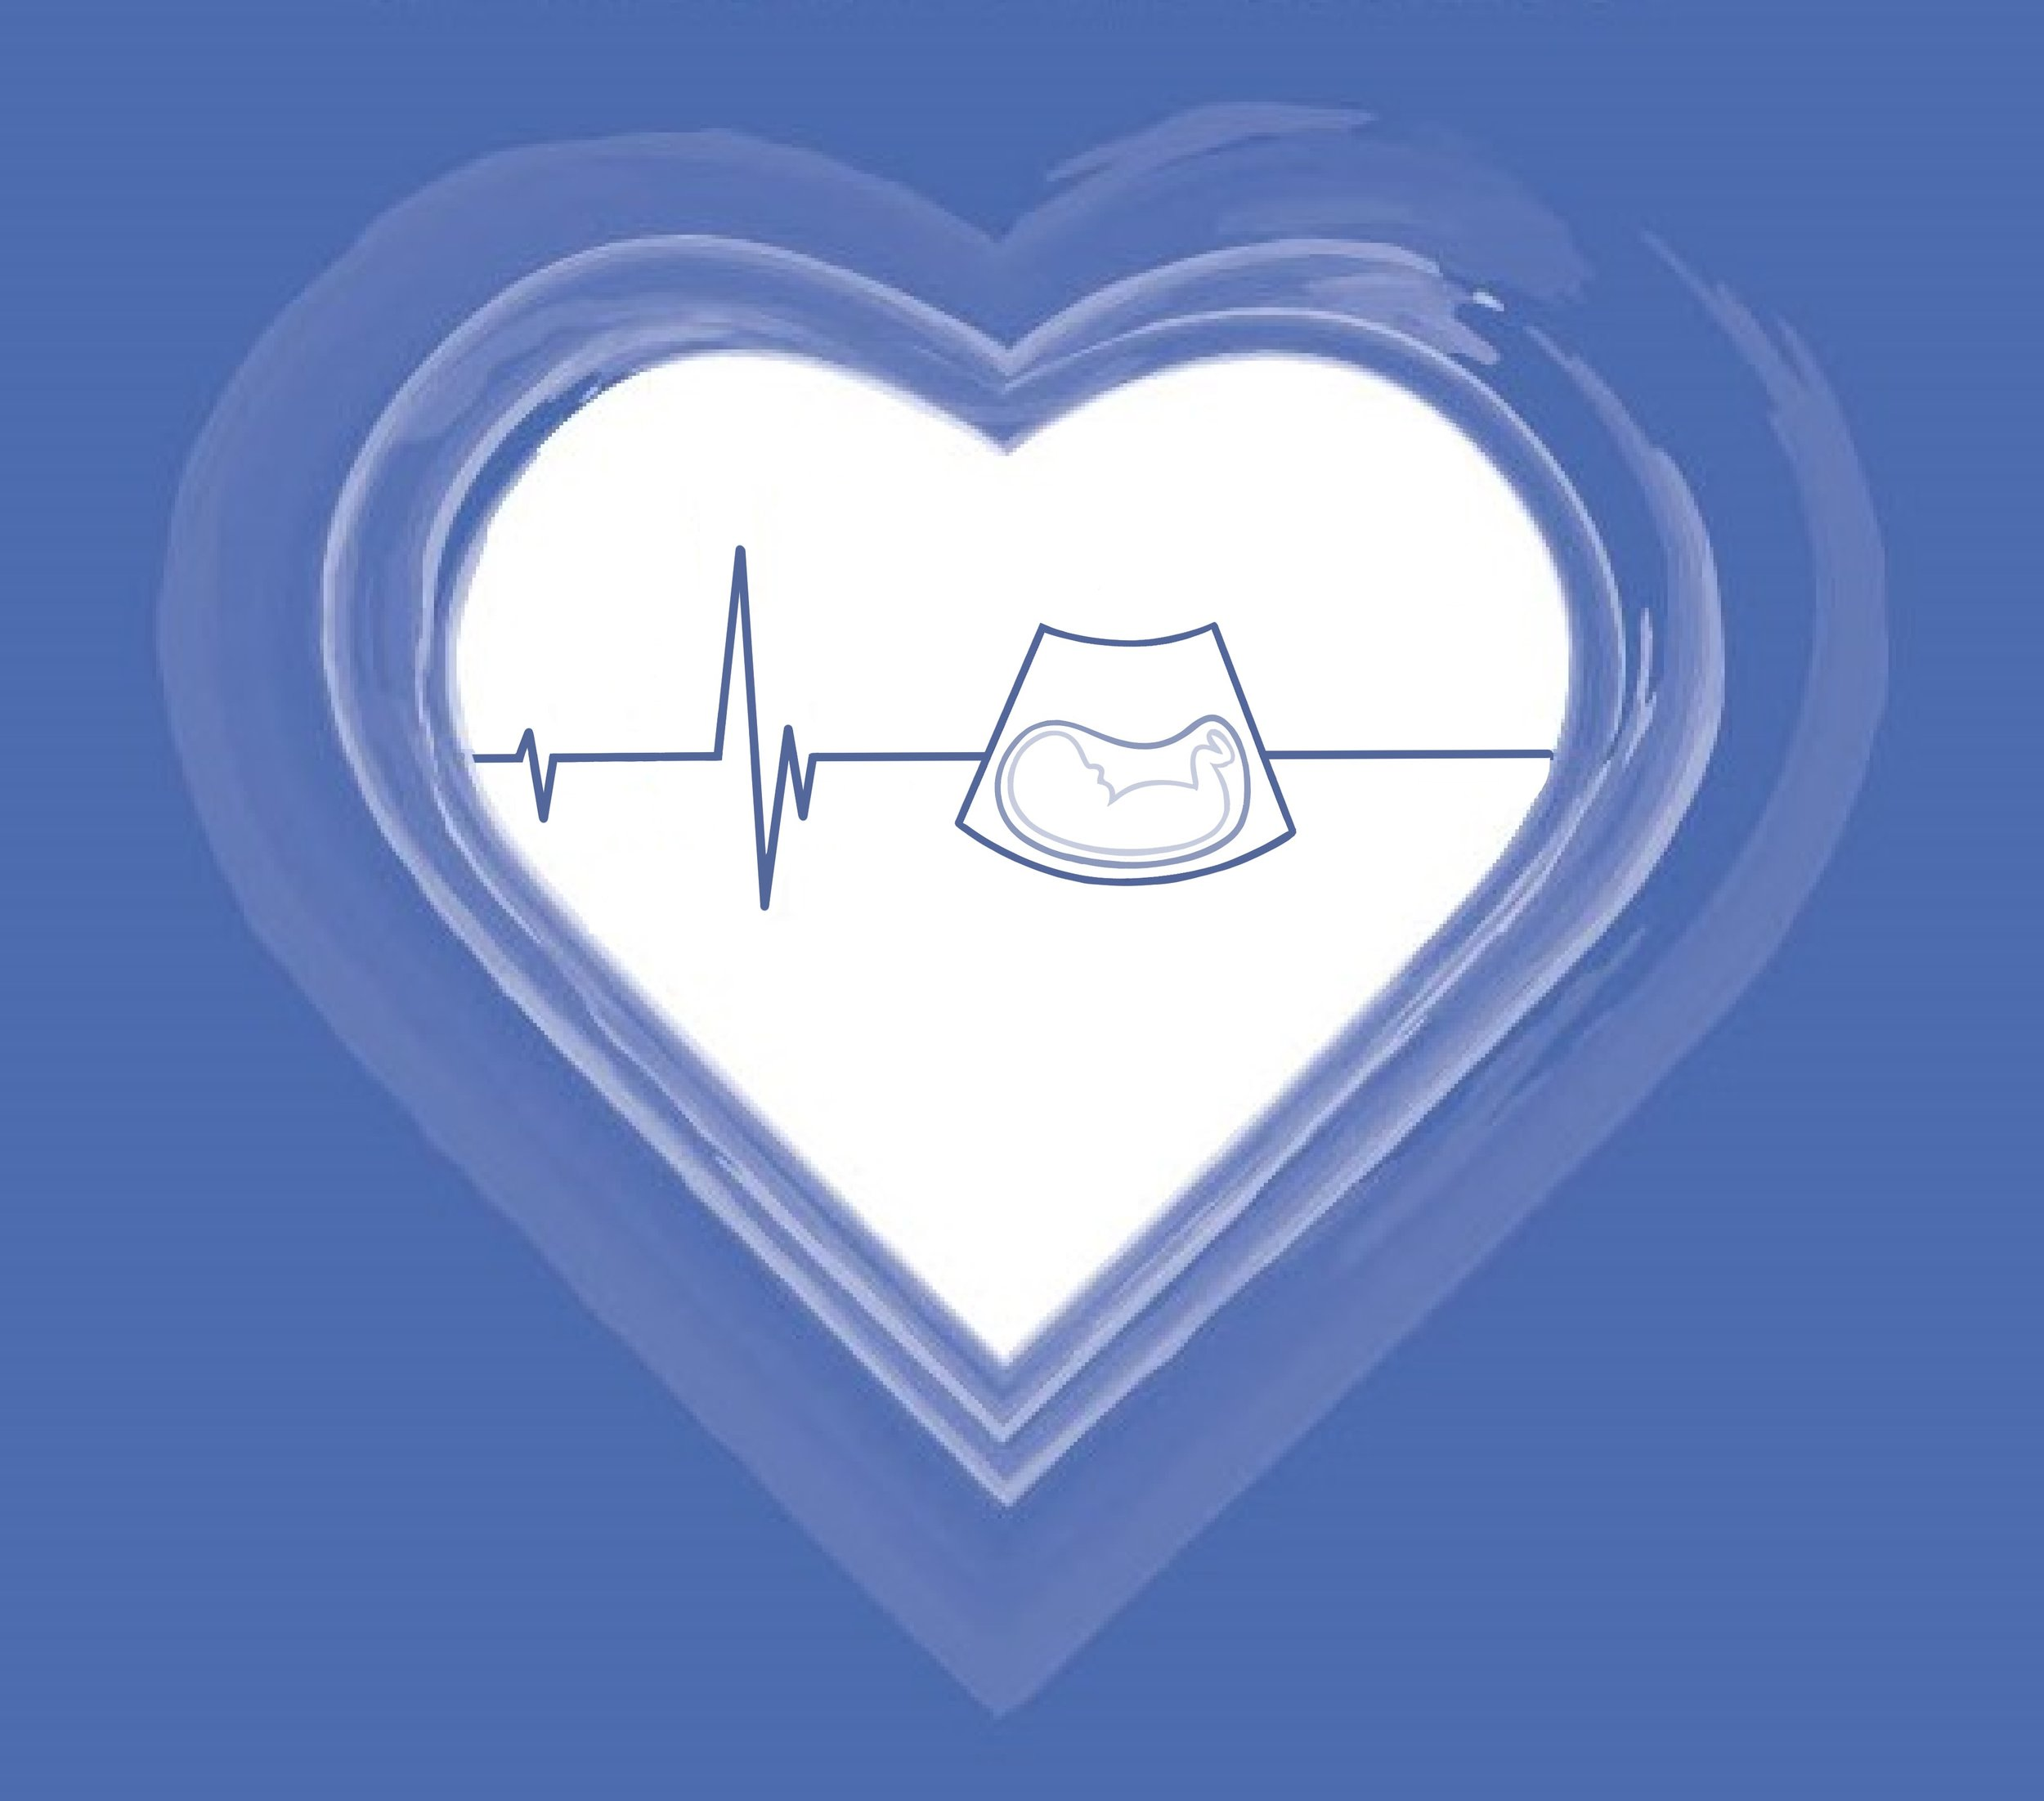 alpha heartbeat ultrasound_cropped.jpg